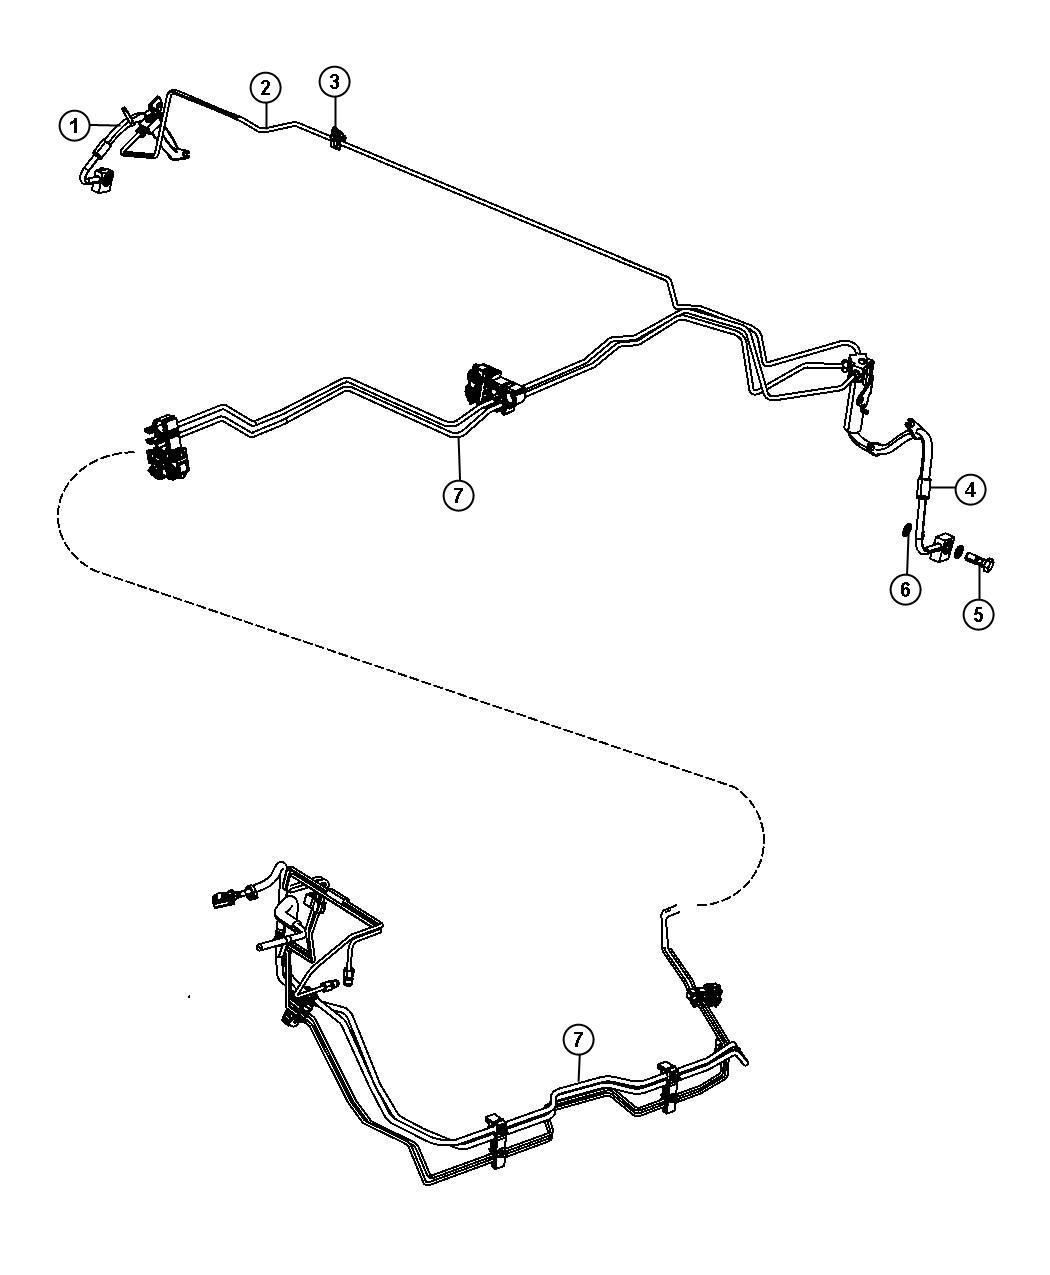 Dodge Durango Tube. Brake. Rear crossover. Hoses, tubes